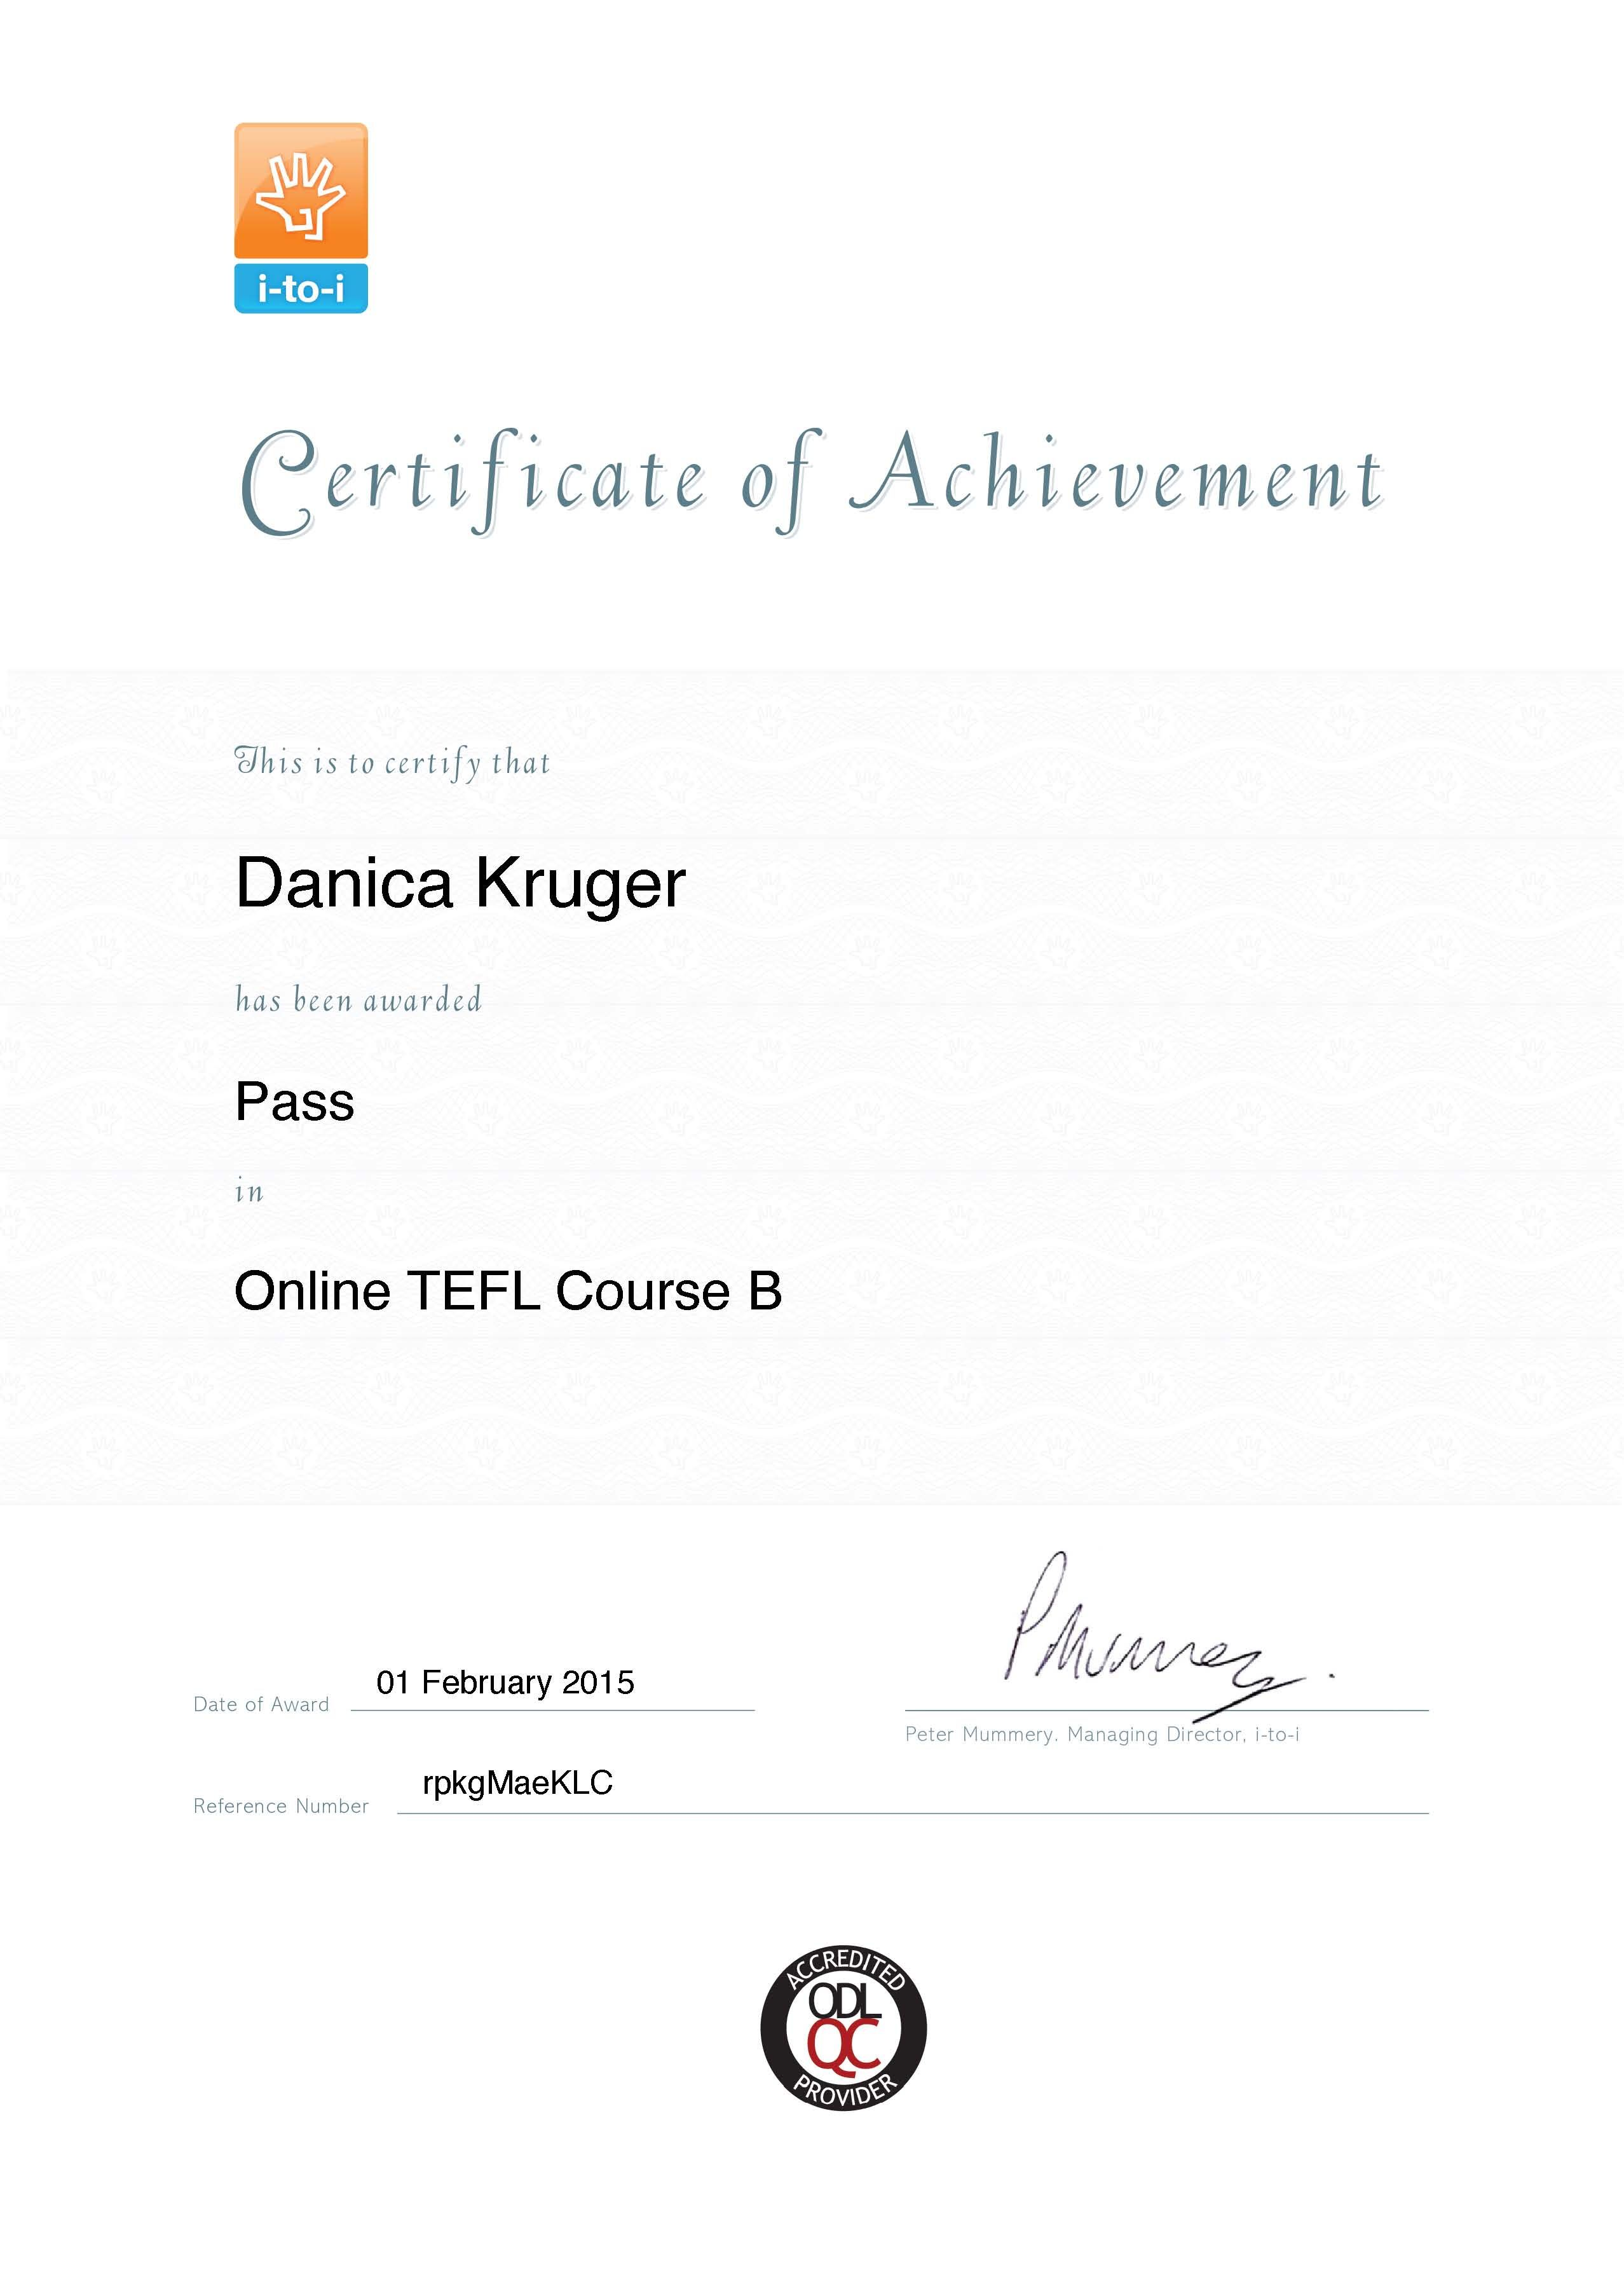 tefl certificate certification achievement kruger